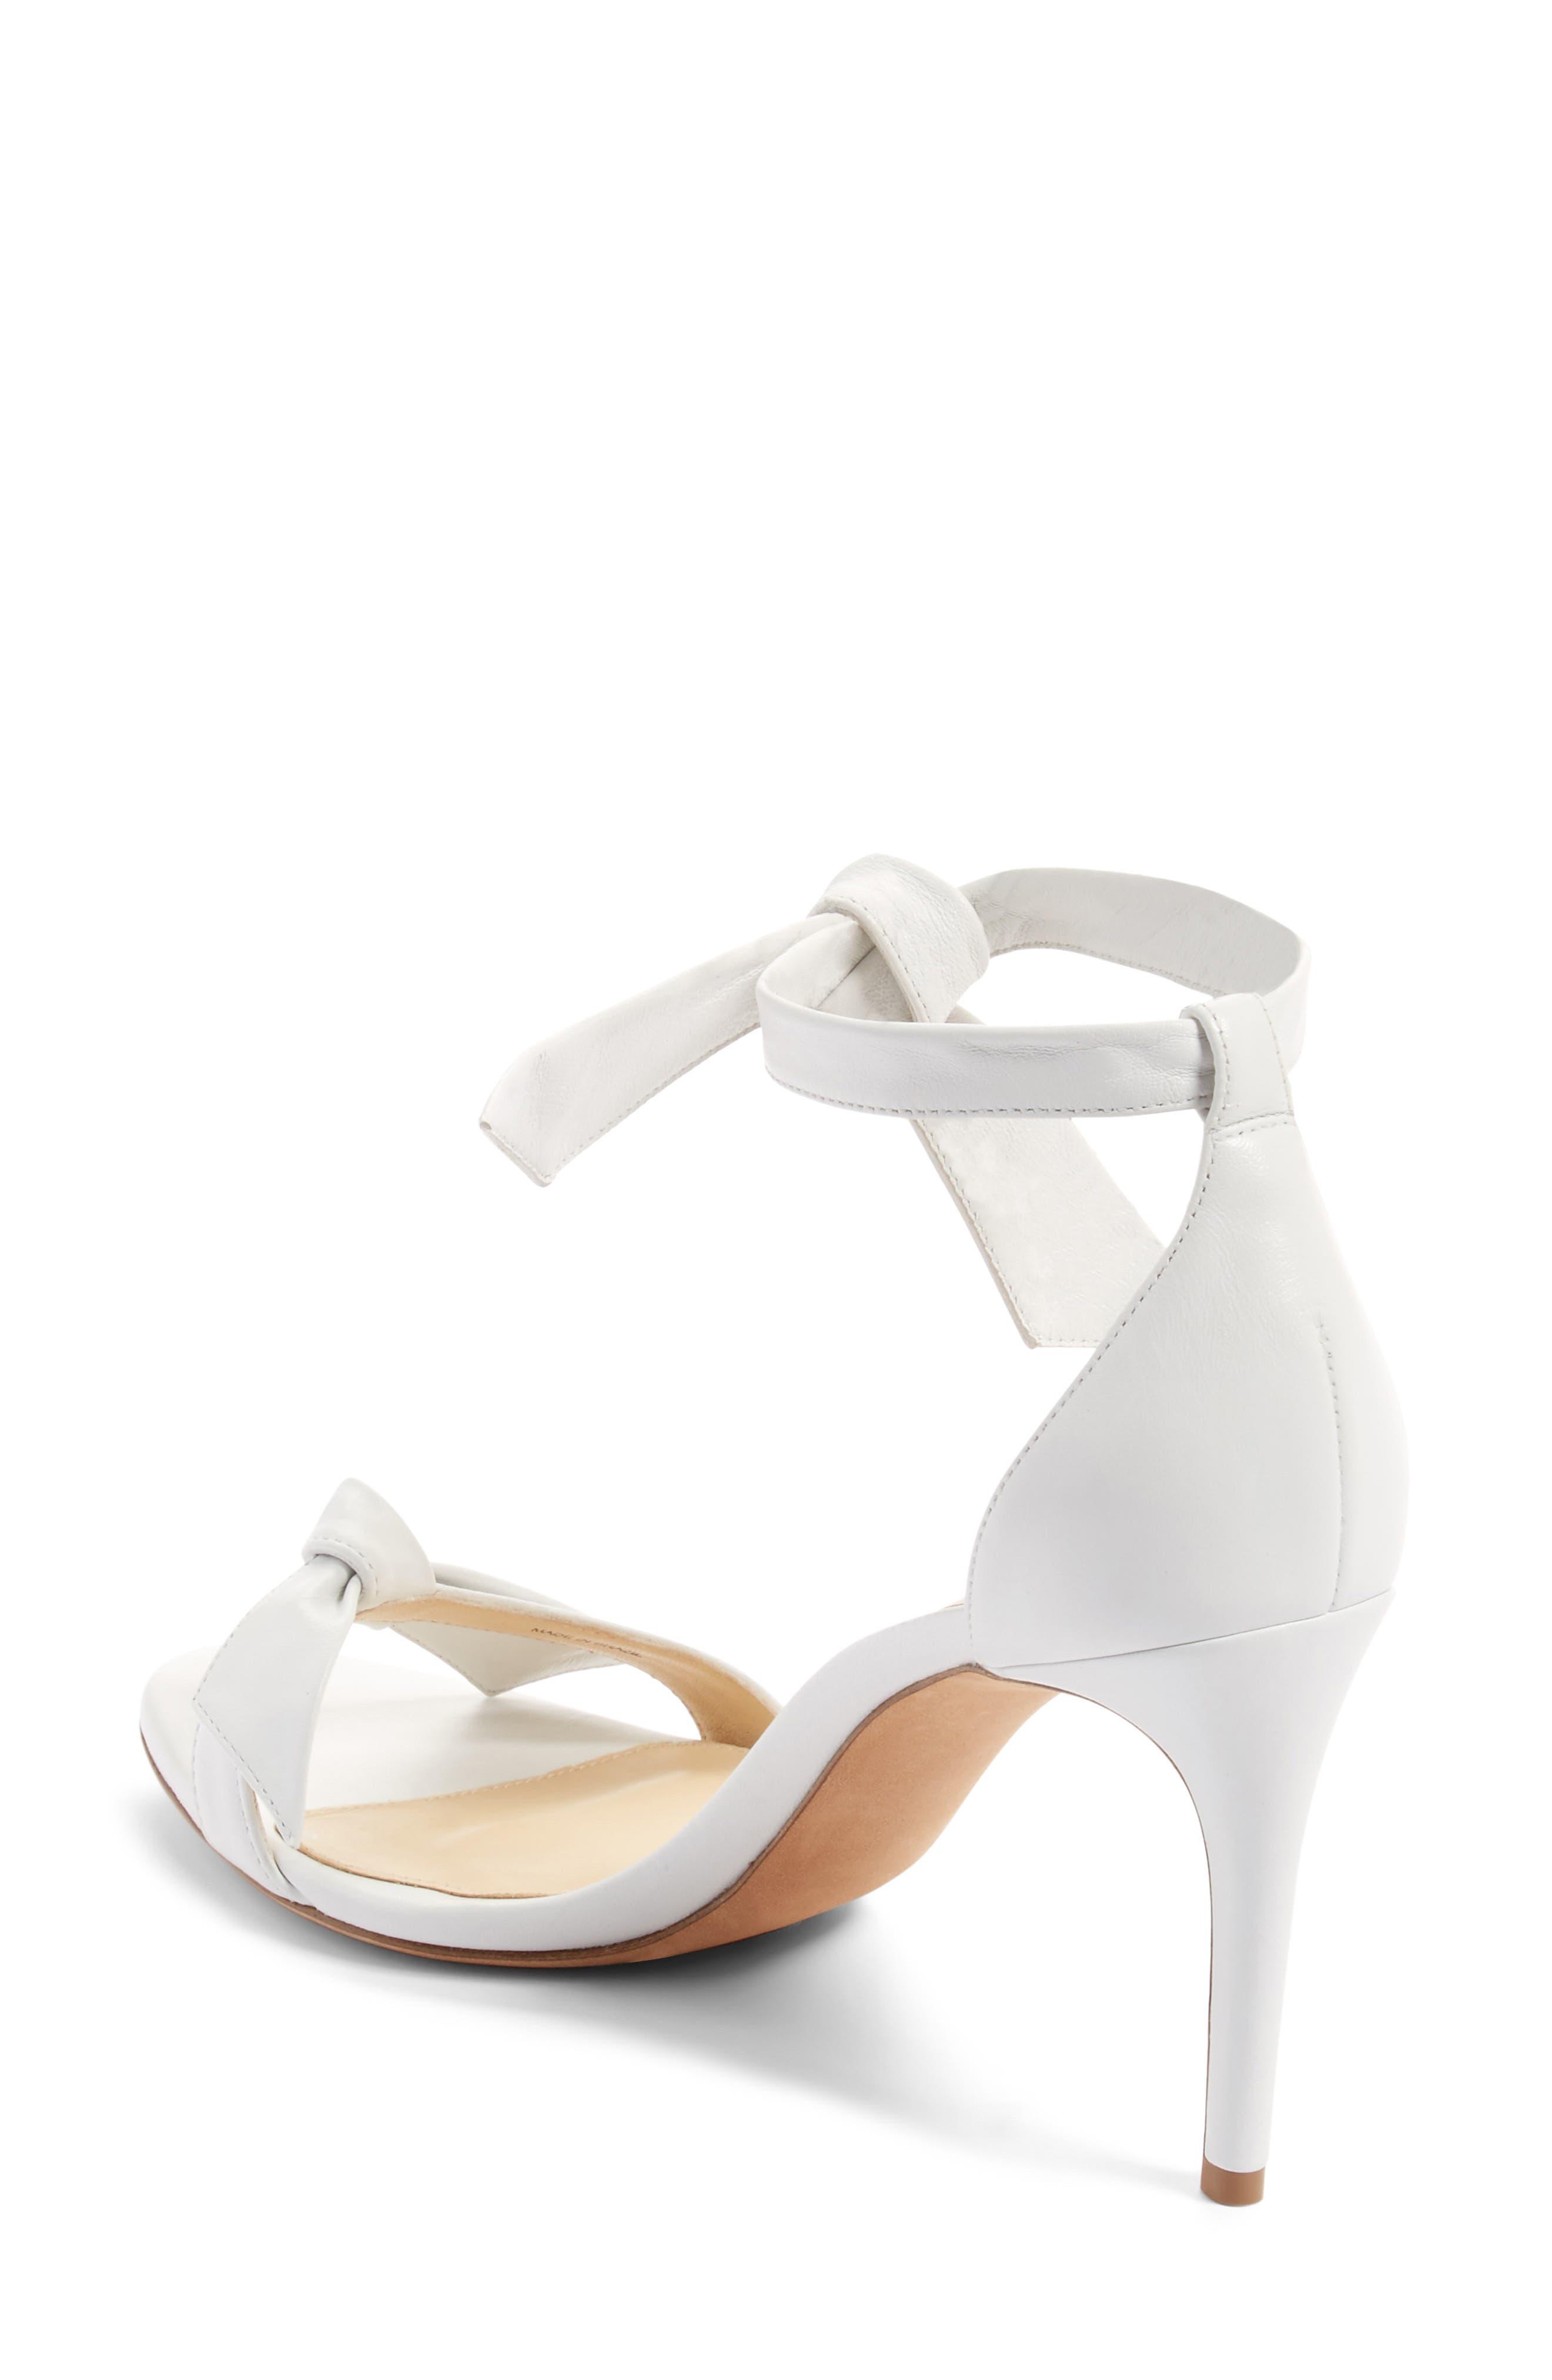 Clarita Ankle Tie Sandal,                         Main,                         color,